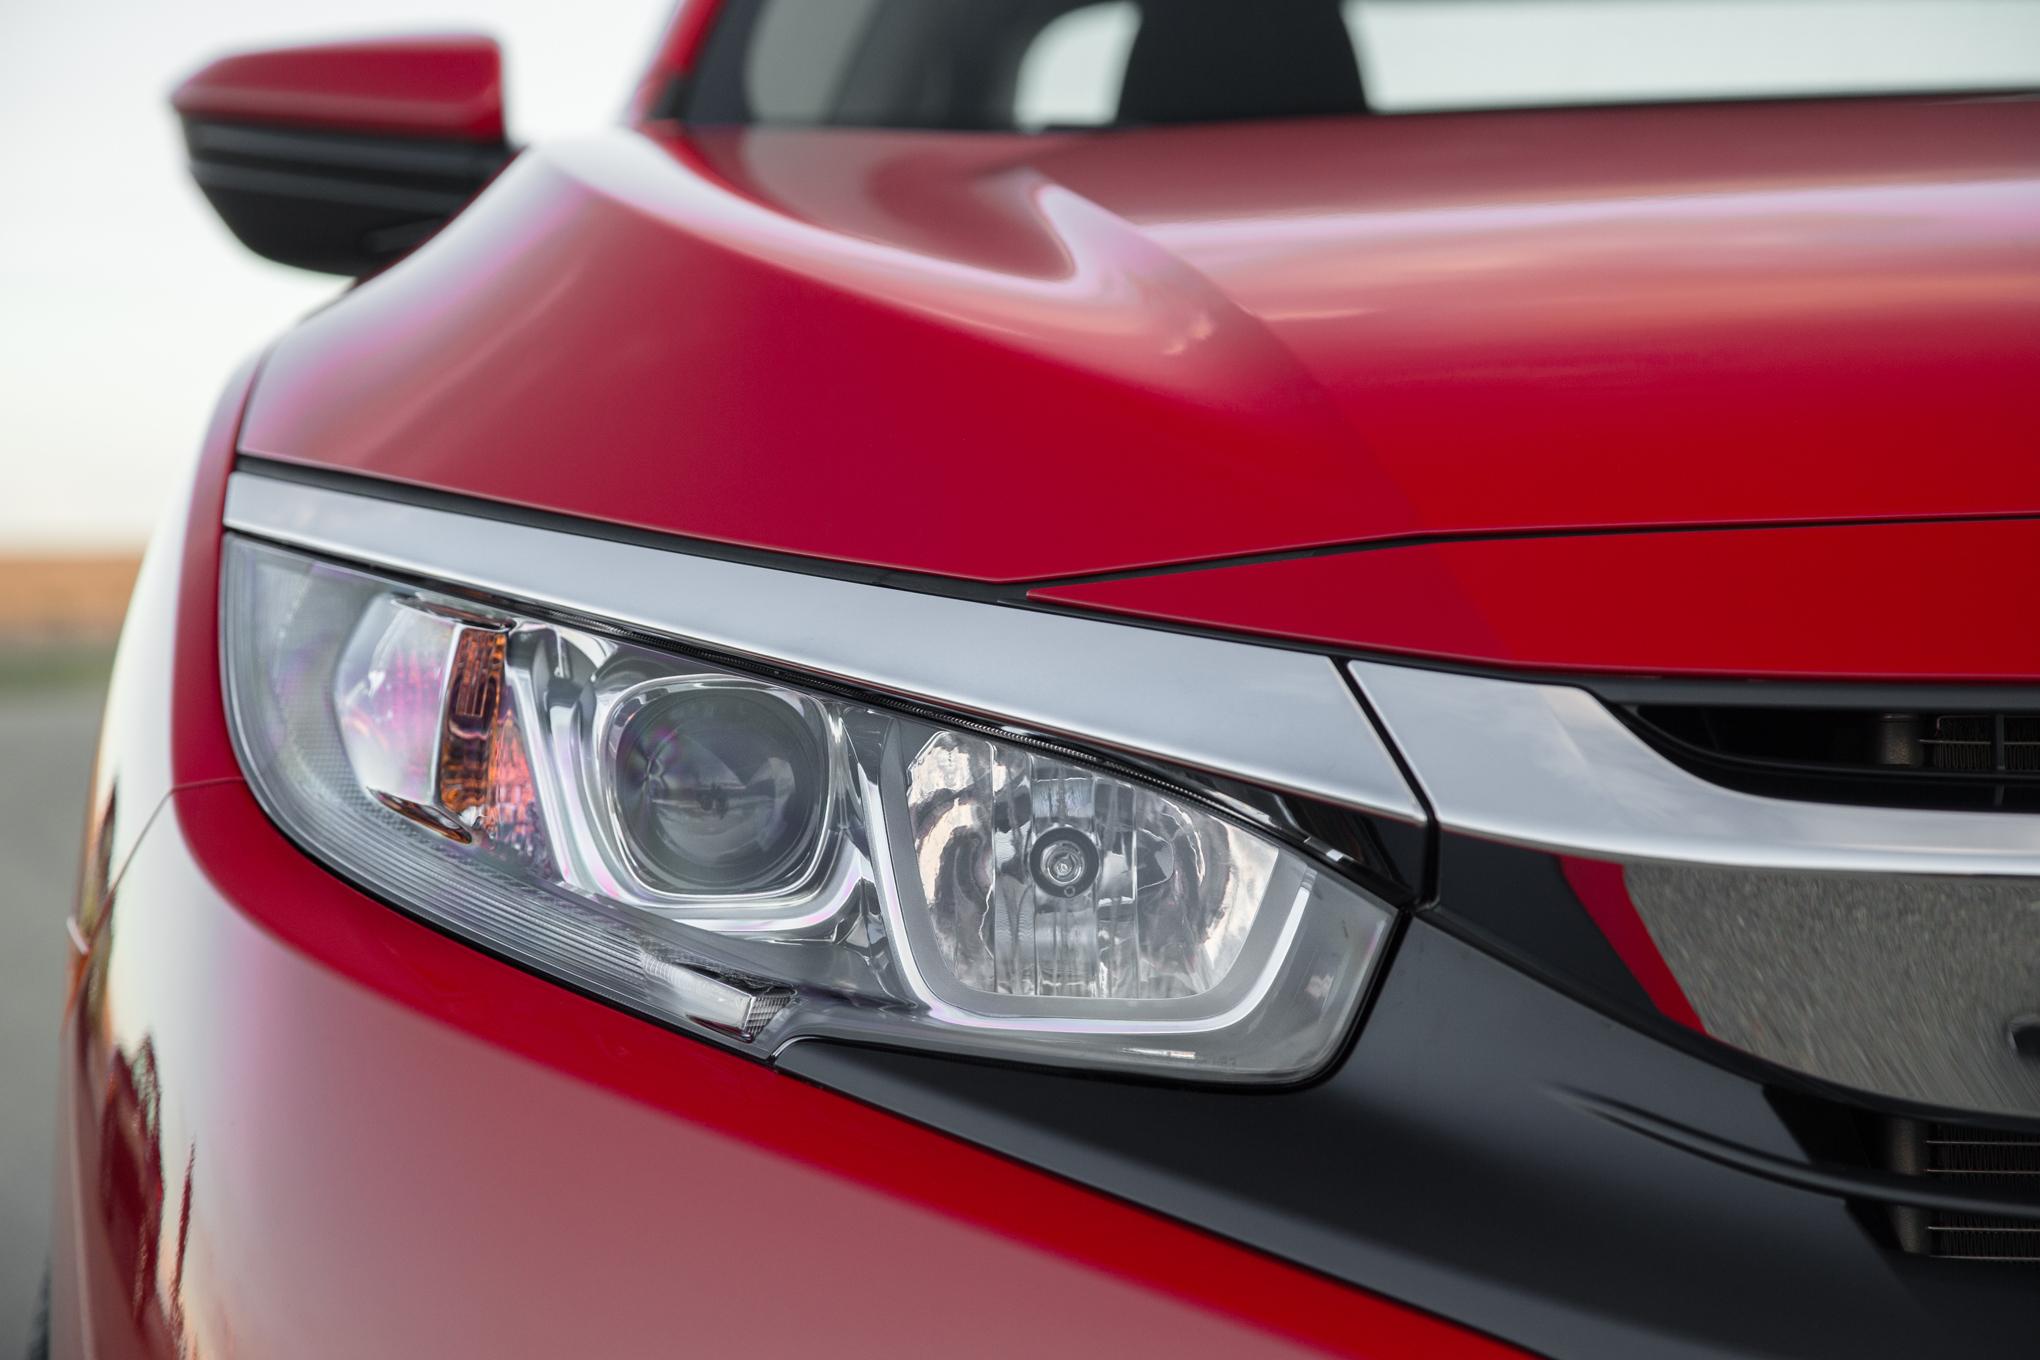 2016 Honda Civic Lx Front Headlight